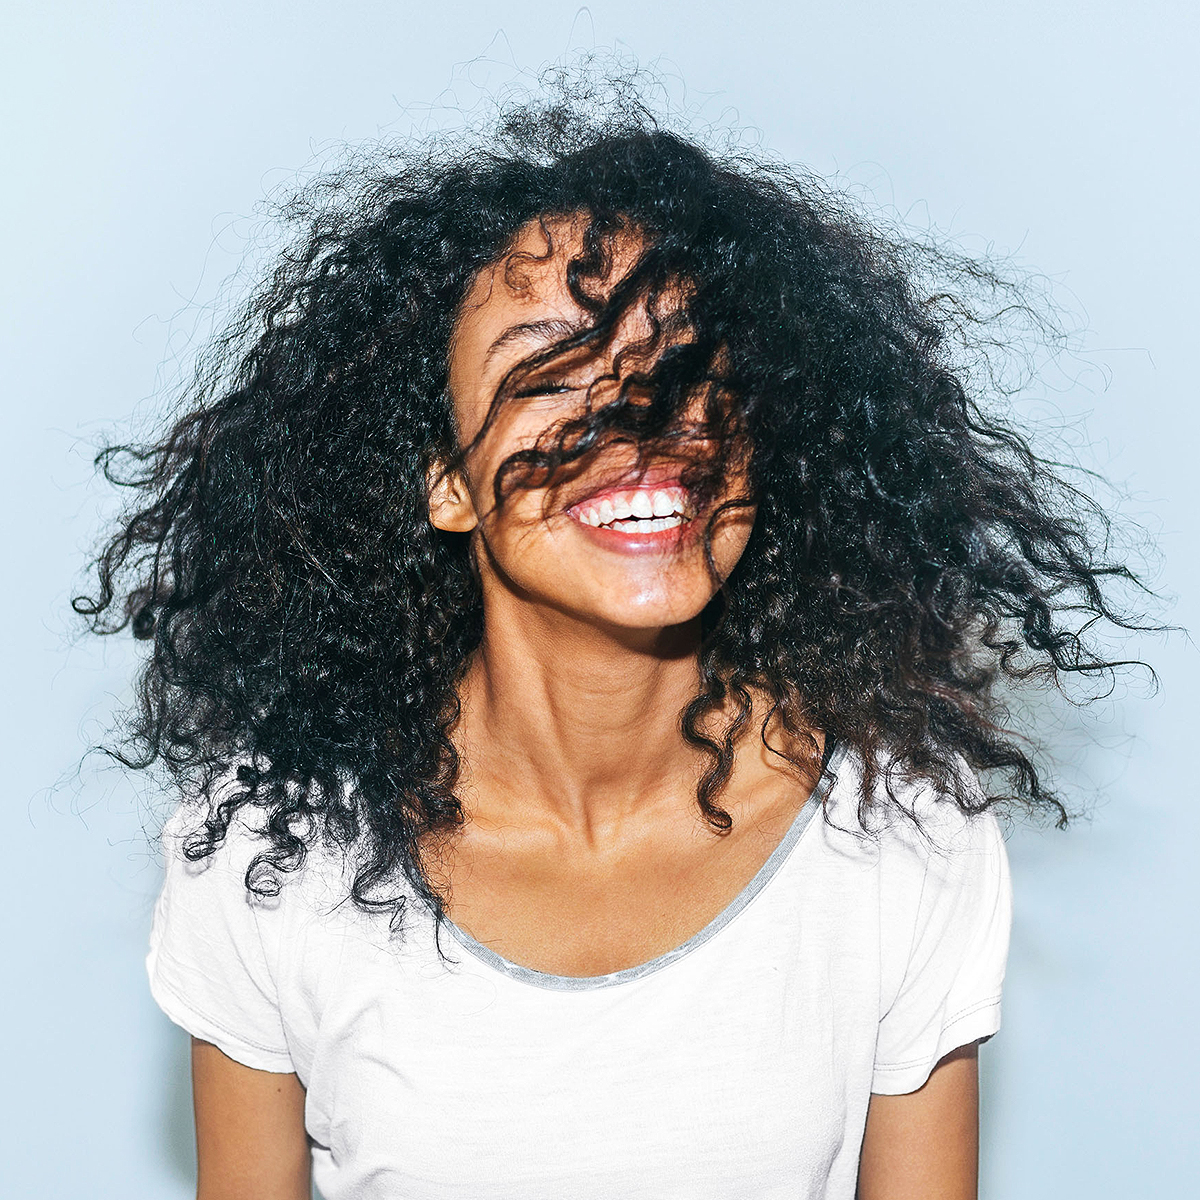 woman-shaking-hair-smiling-508e7abf